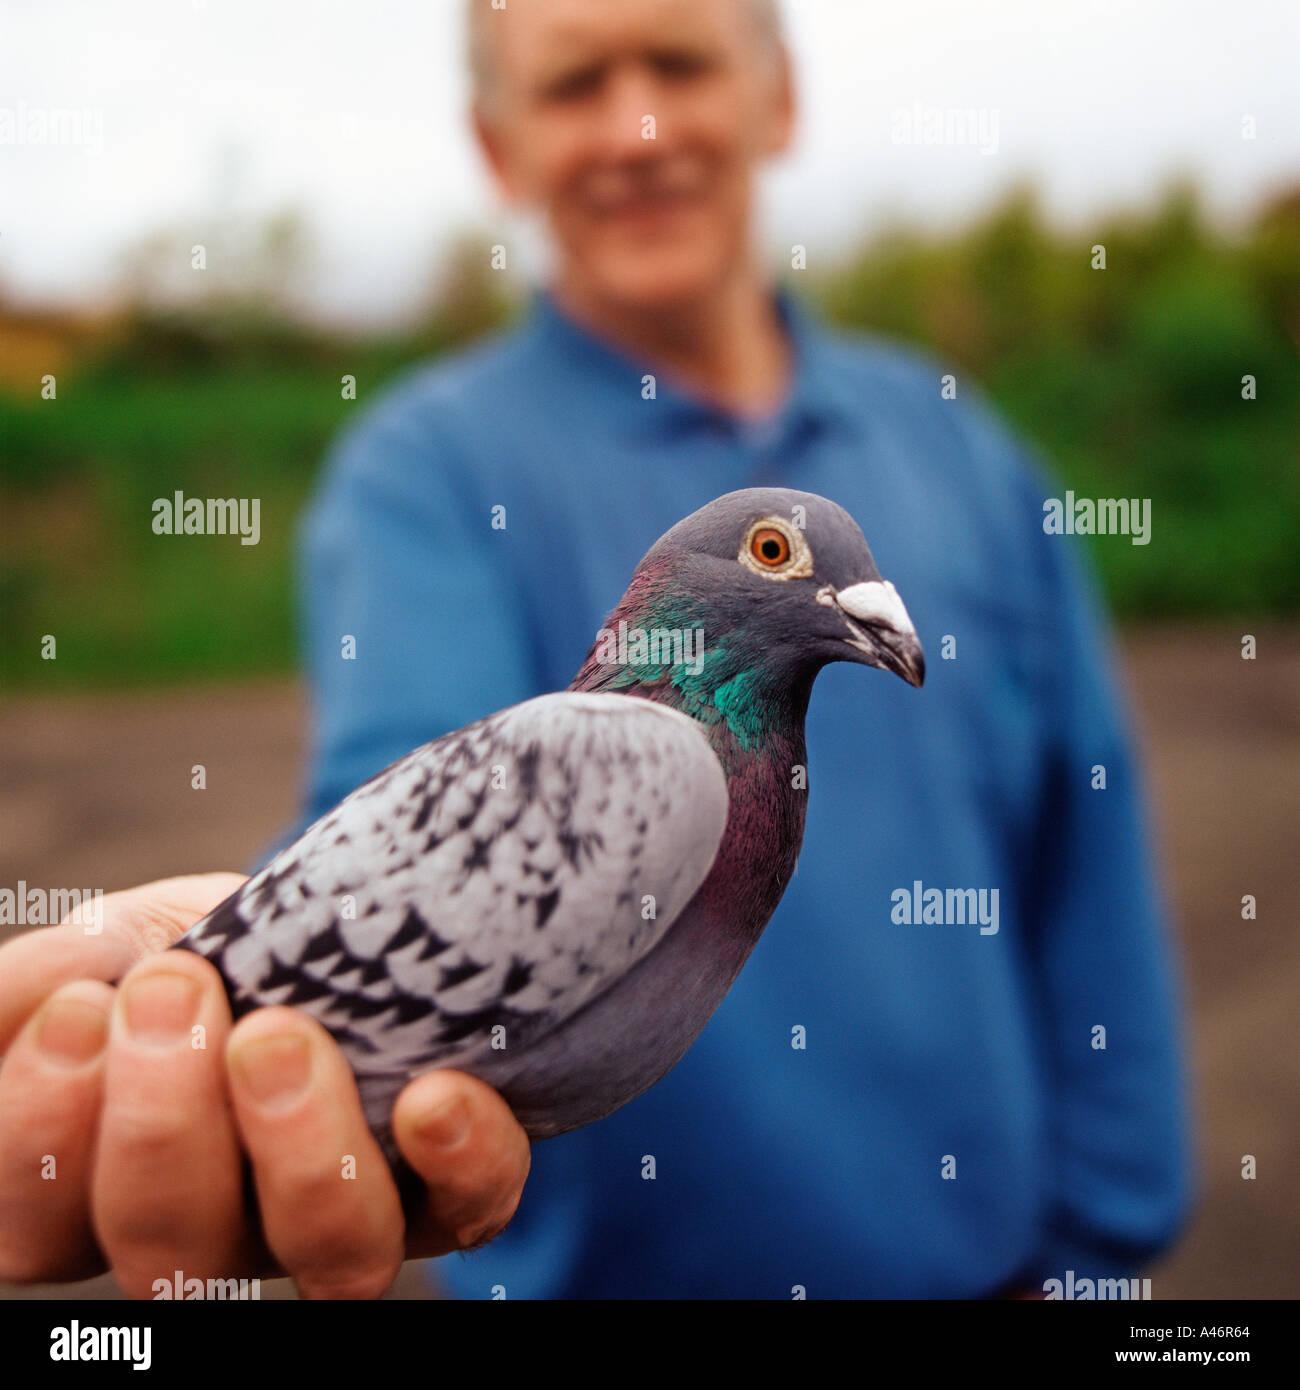 Hombre sujetando el pet pigeon Imagen De Stock